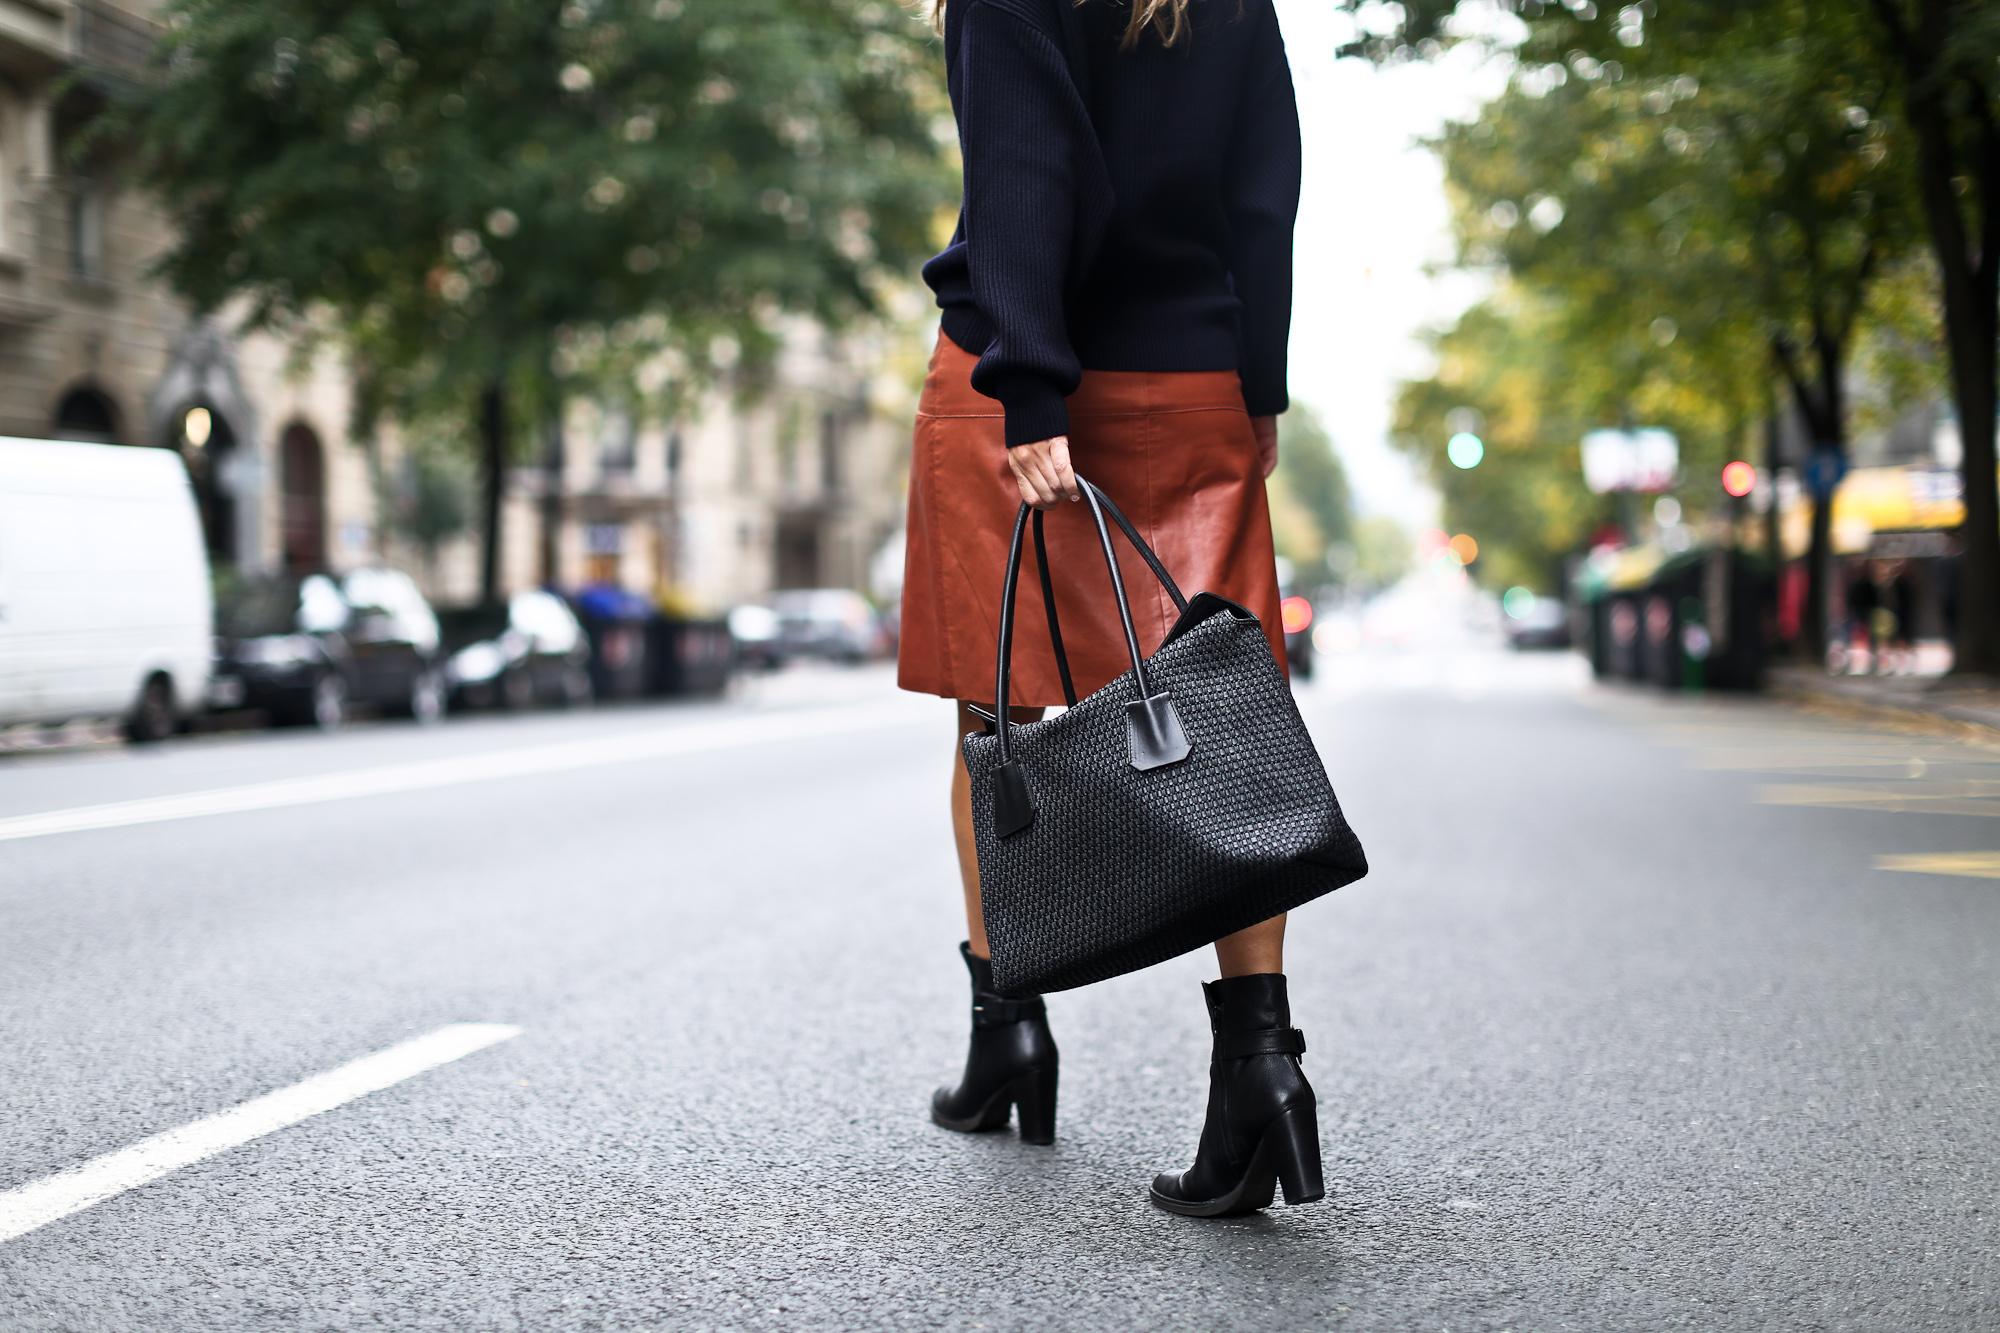 Clochet_boxcalf_bolso_negro_piel_trenzada_fillipak_leather_skirt-14